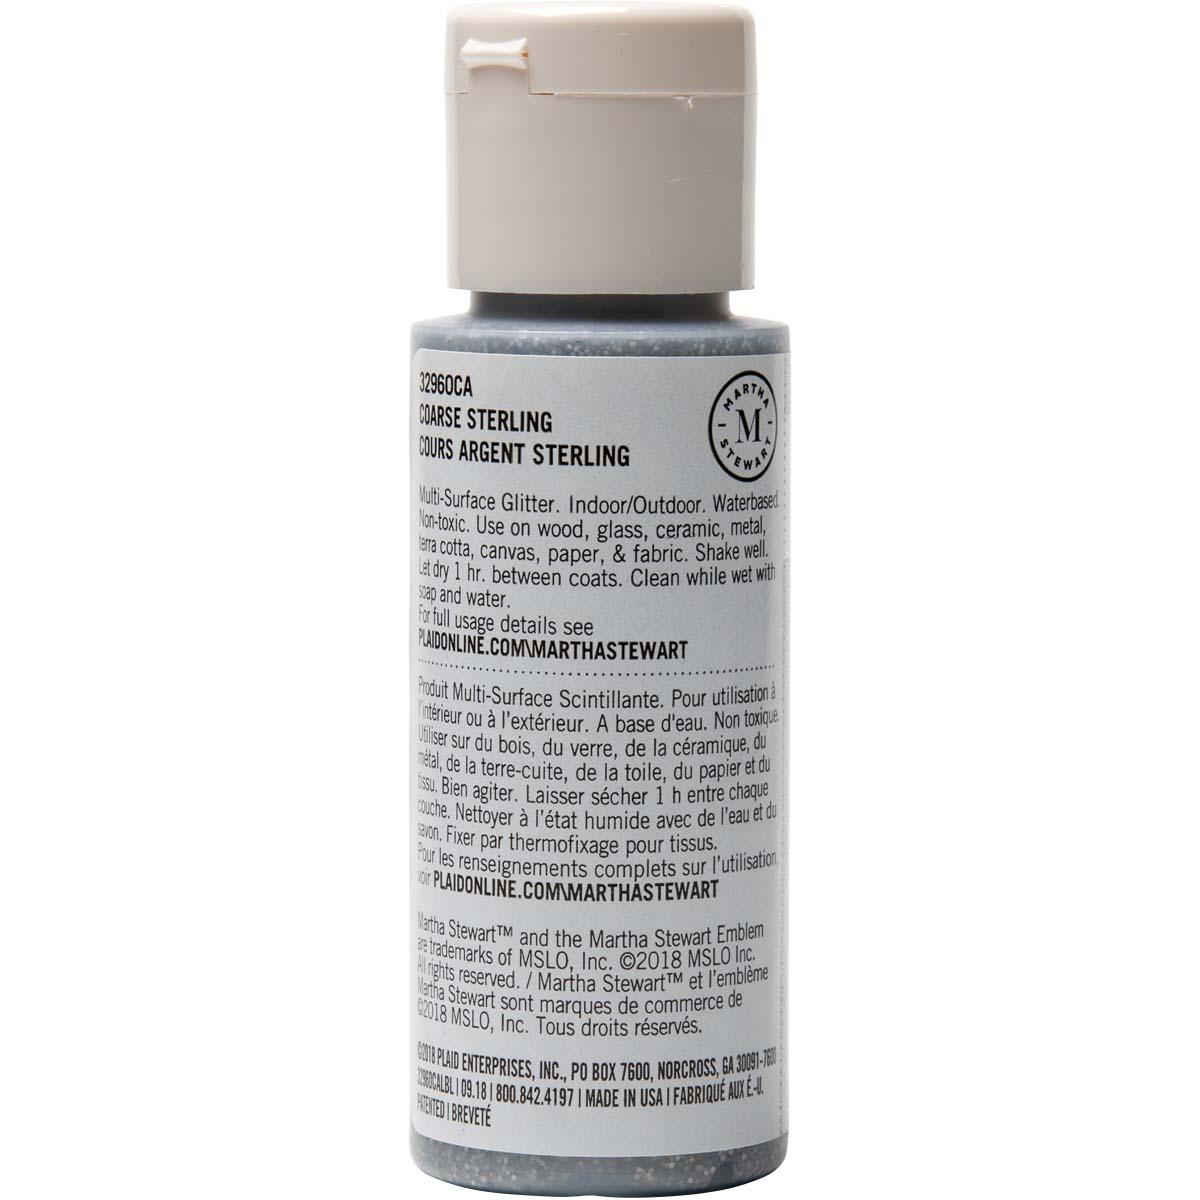 Martha Stewart ® Multi-Surface Coarse Glitter Acrylic Craft Paint - Sterling, 2 oz. - 32960CA